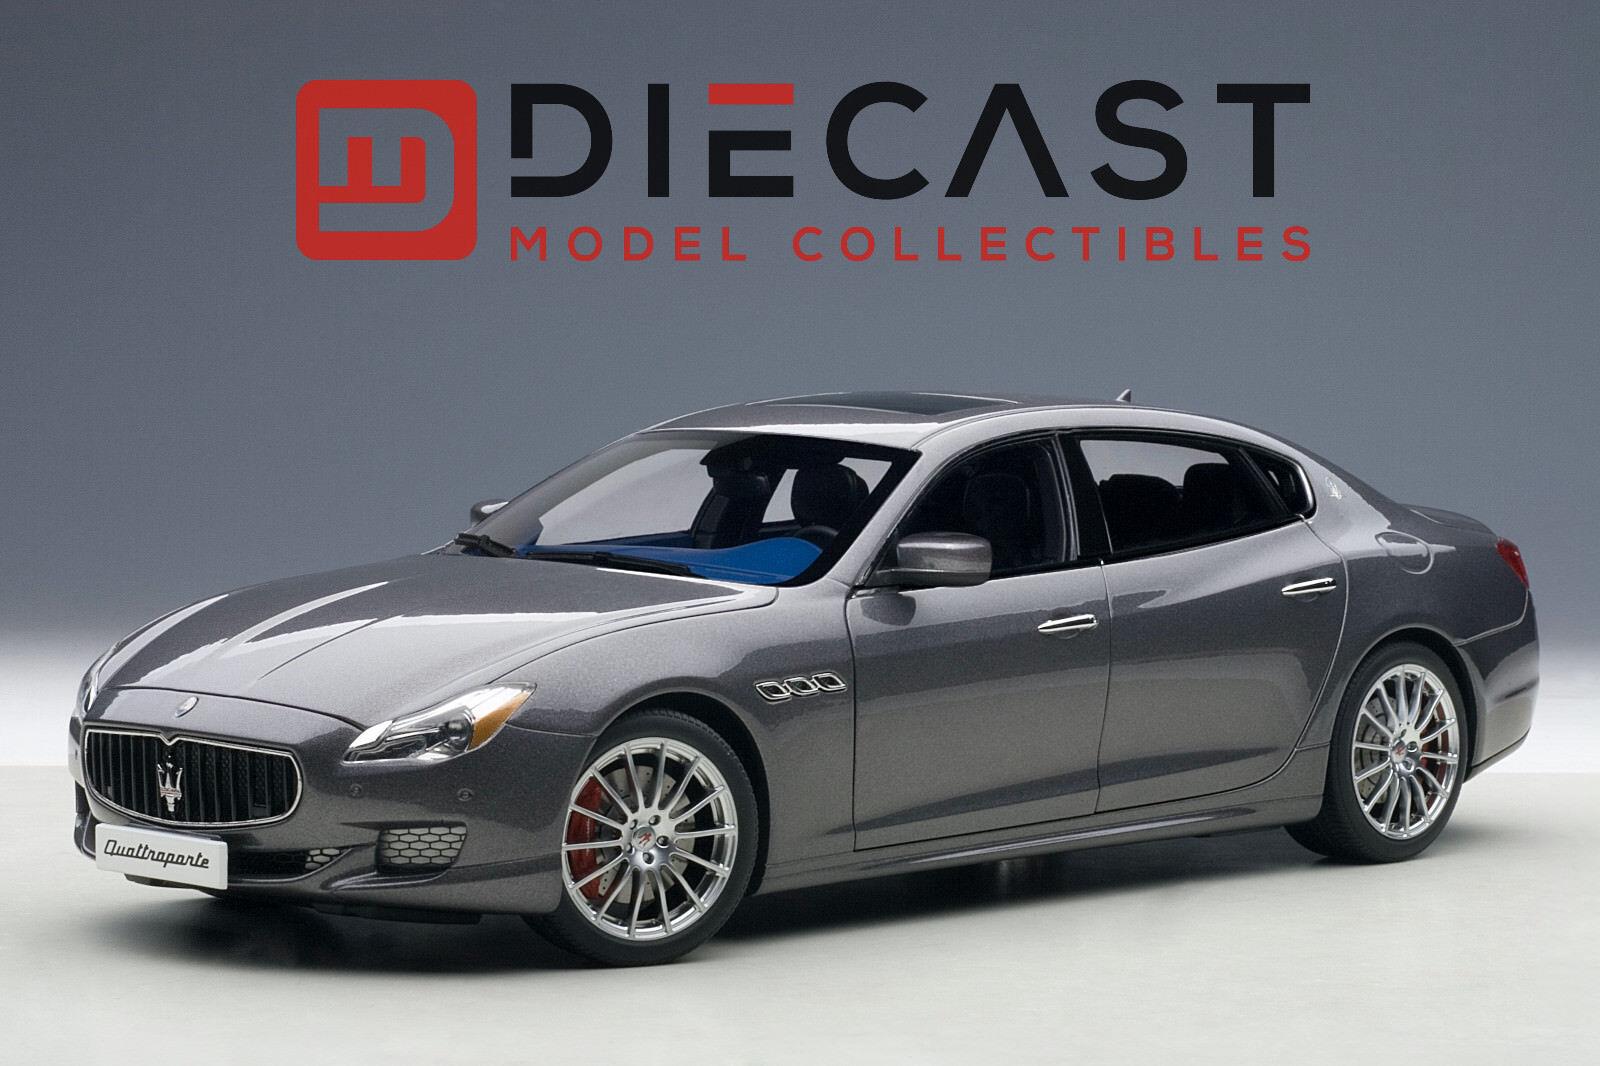 Maserati gts autoart 75806 quattroporte 2015 (maratea grau) 1 18th skala